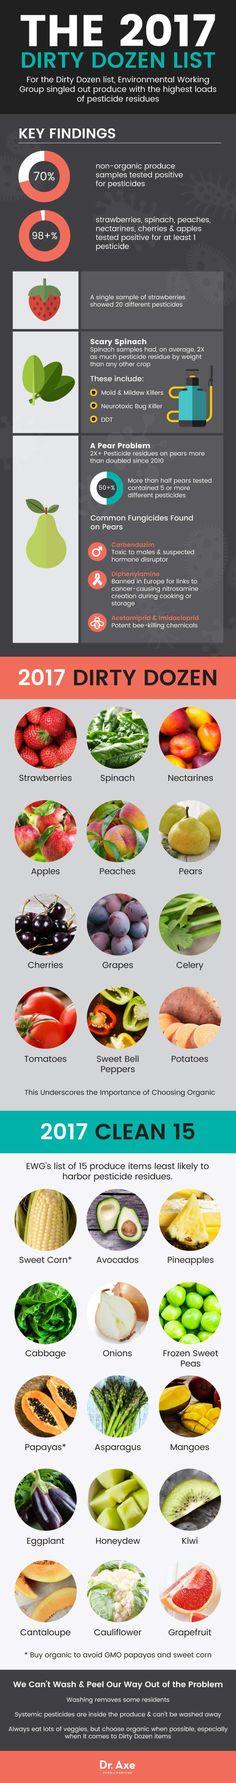 2017 dirty dozen - Dr. Axe http://www.draxe.com #health #holistic #natural